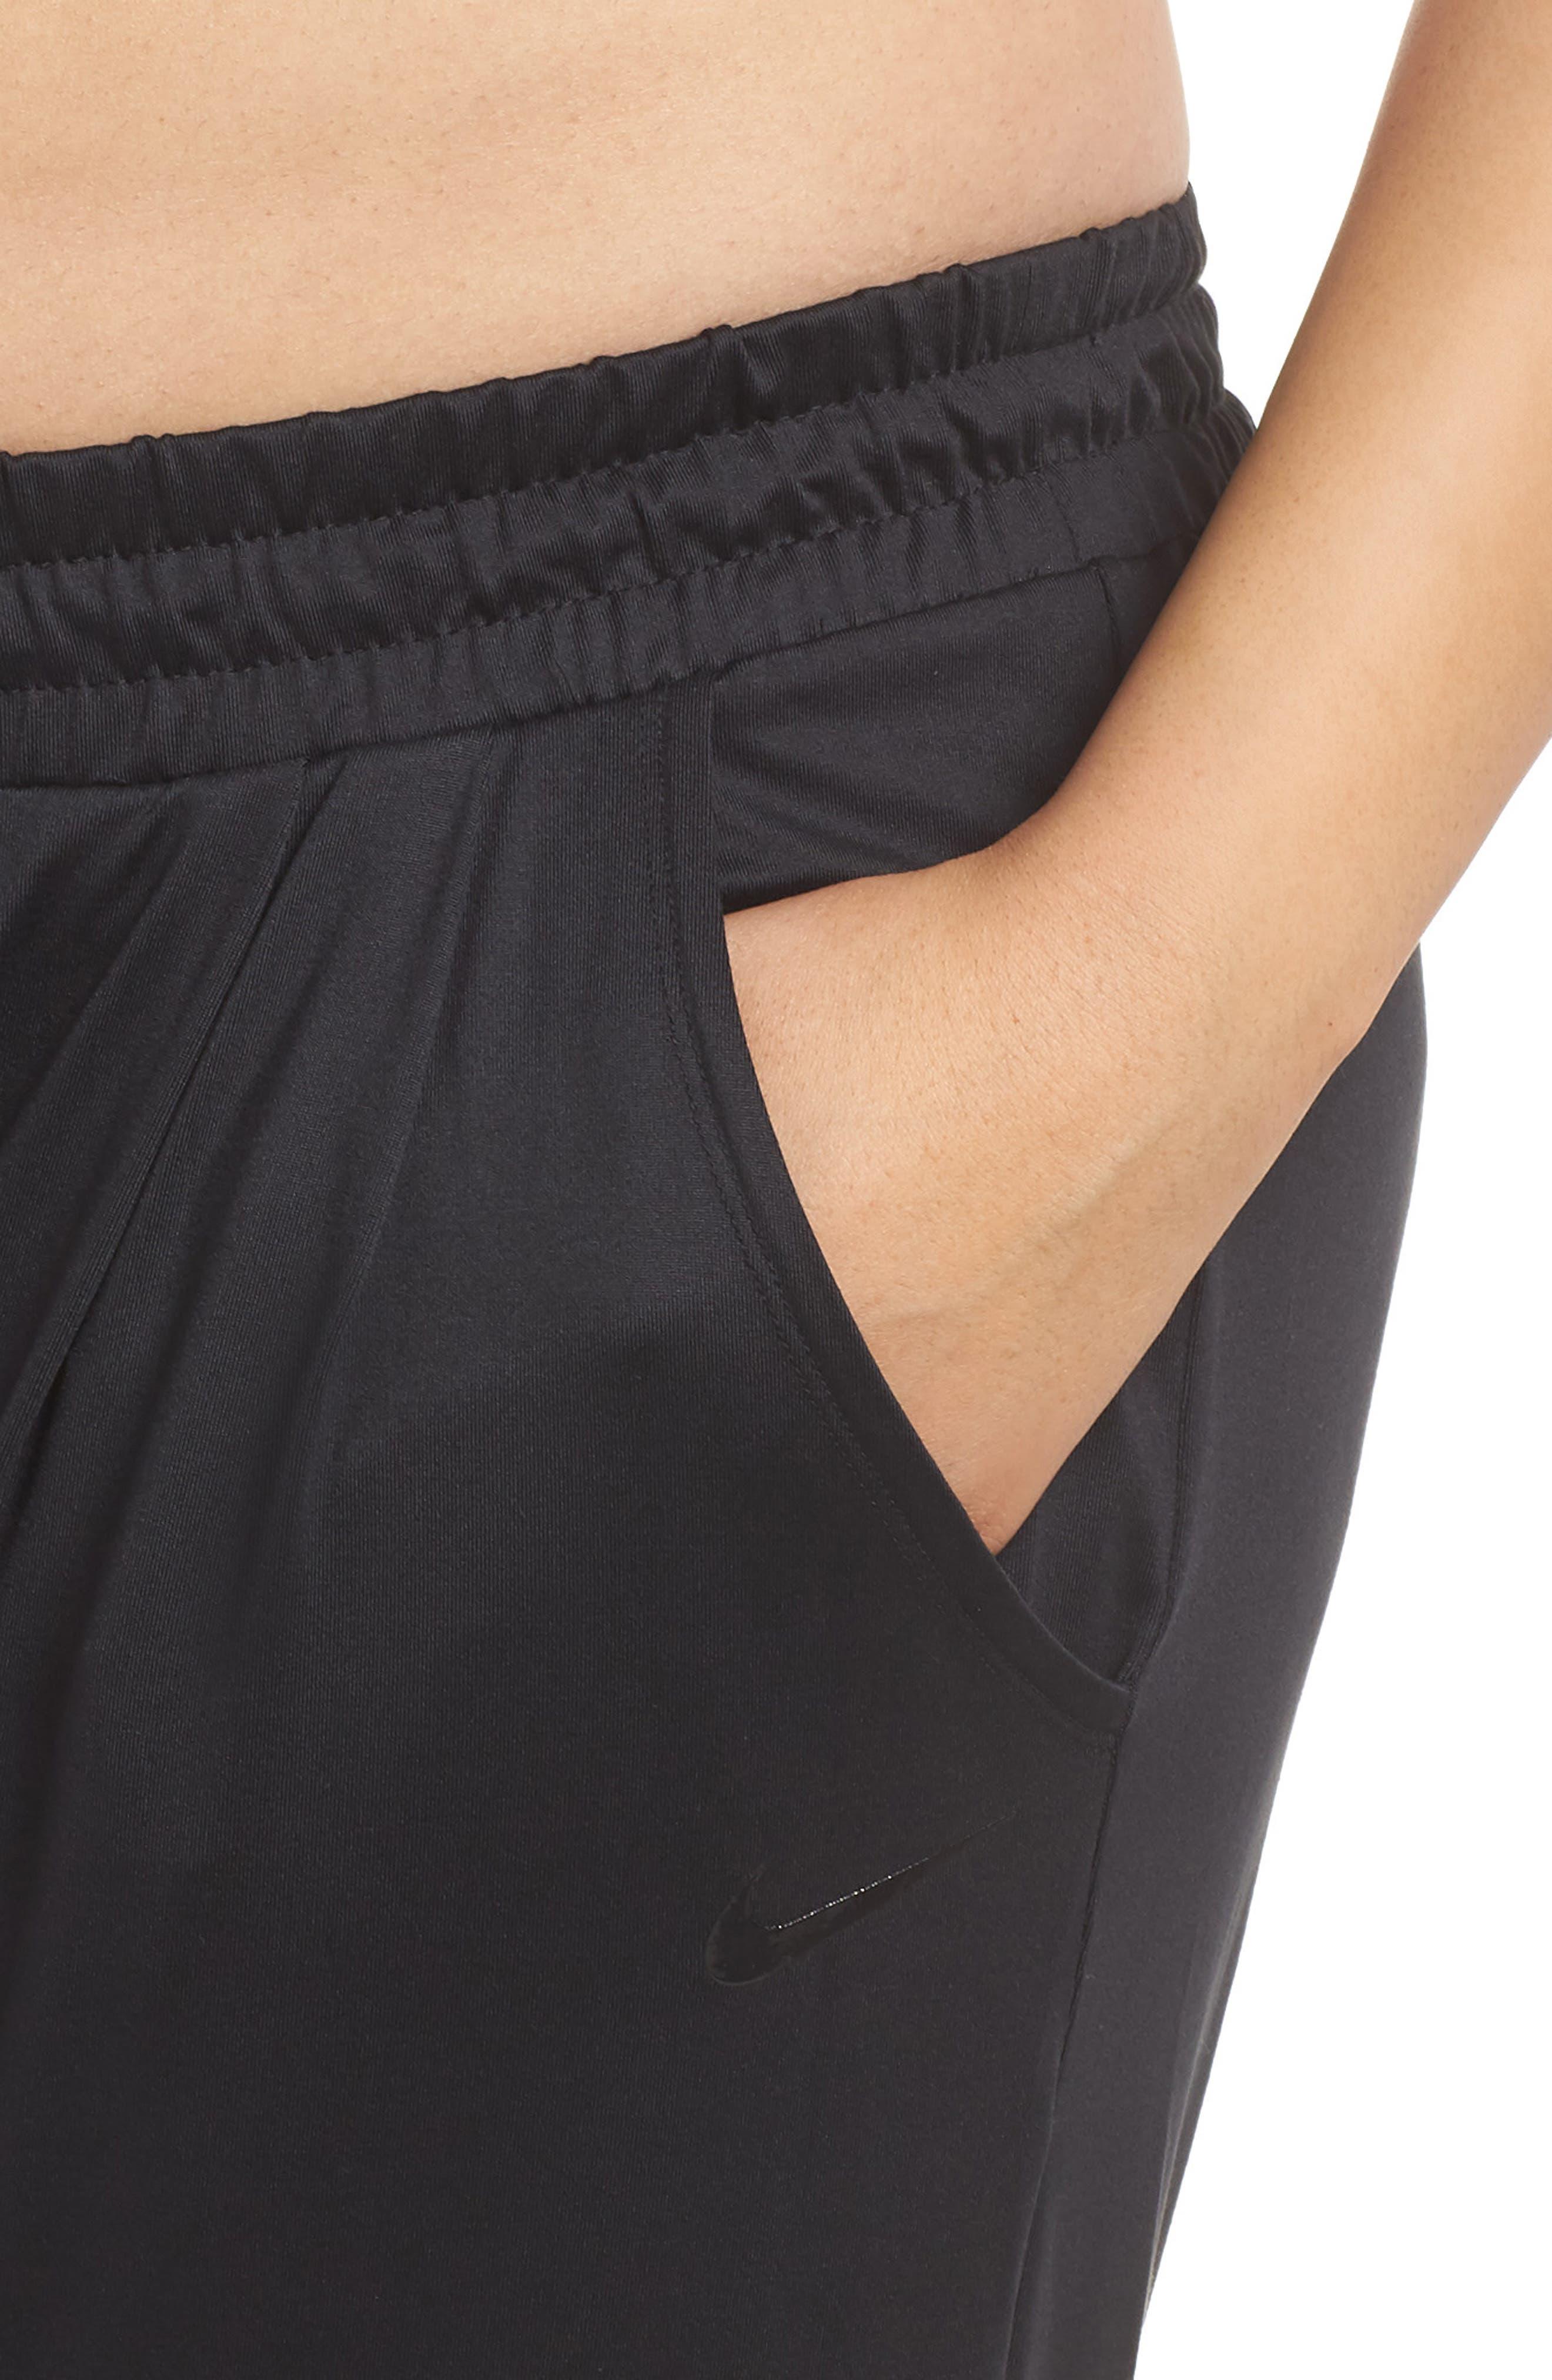 Dry Lux Flow Training Pants,                             Alternate thumbnail 4, color,                             Black/ Clear